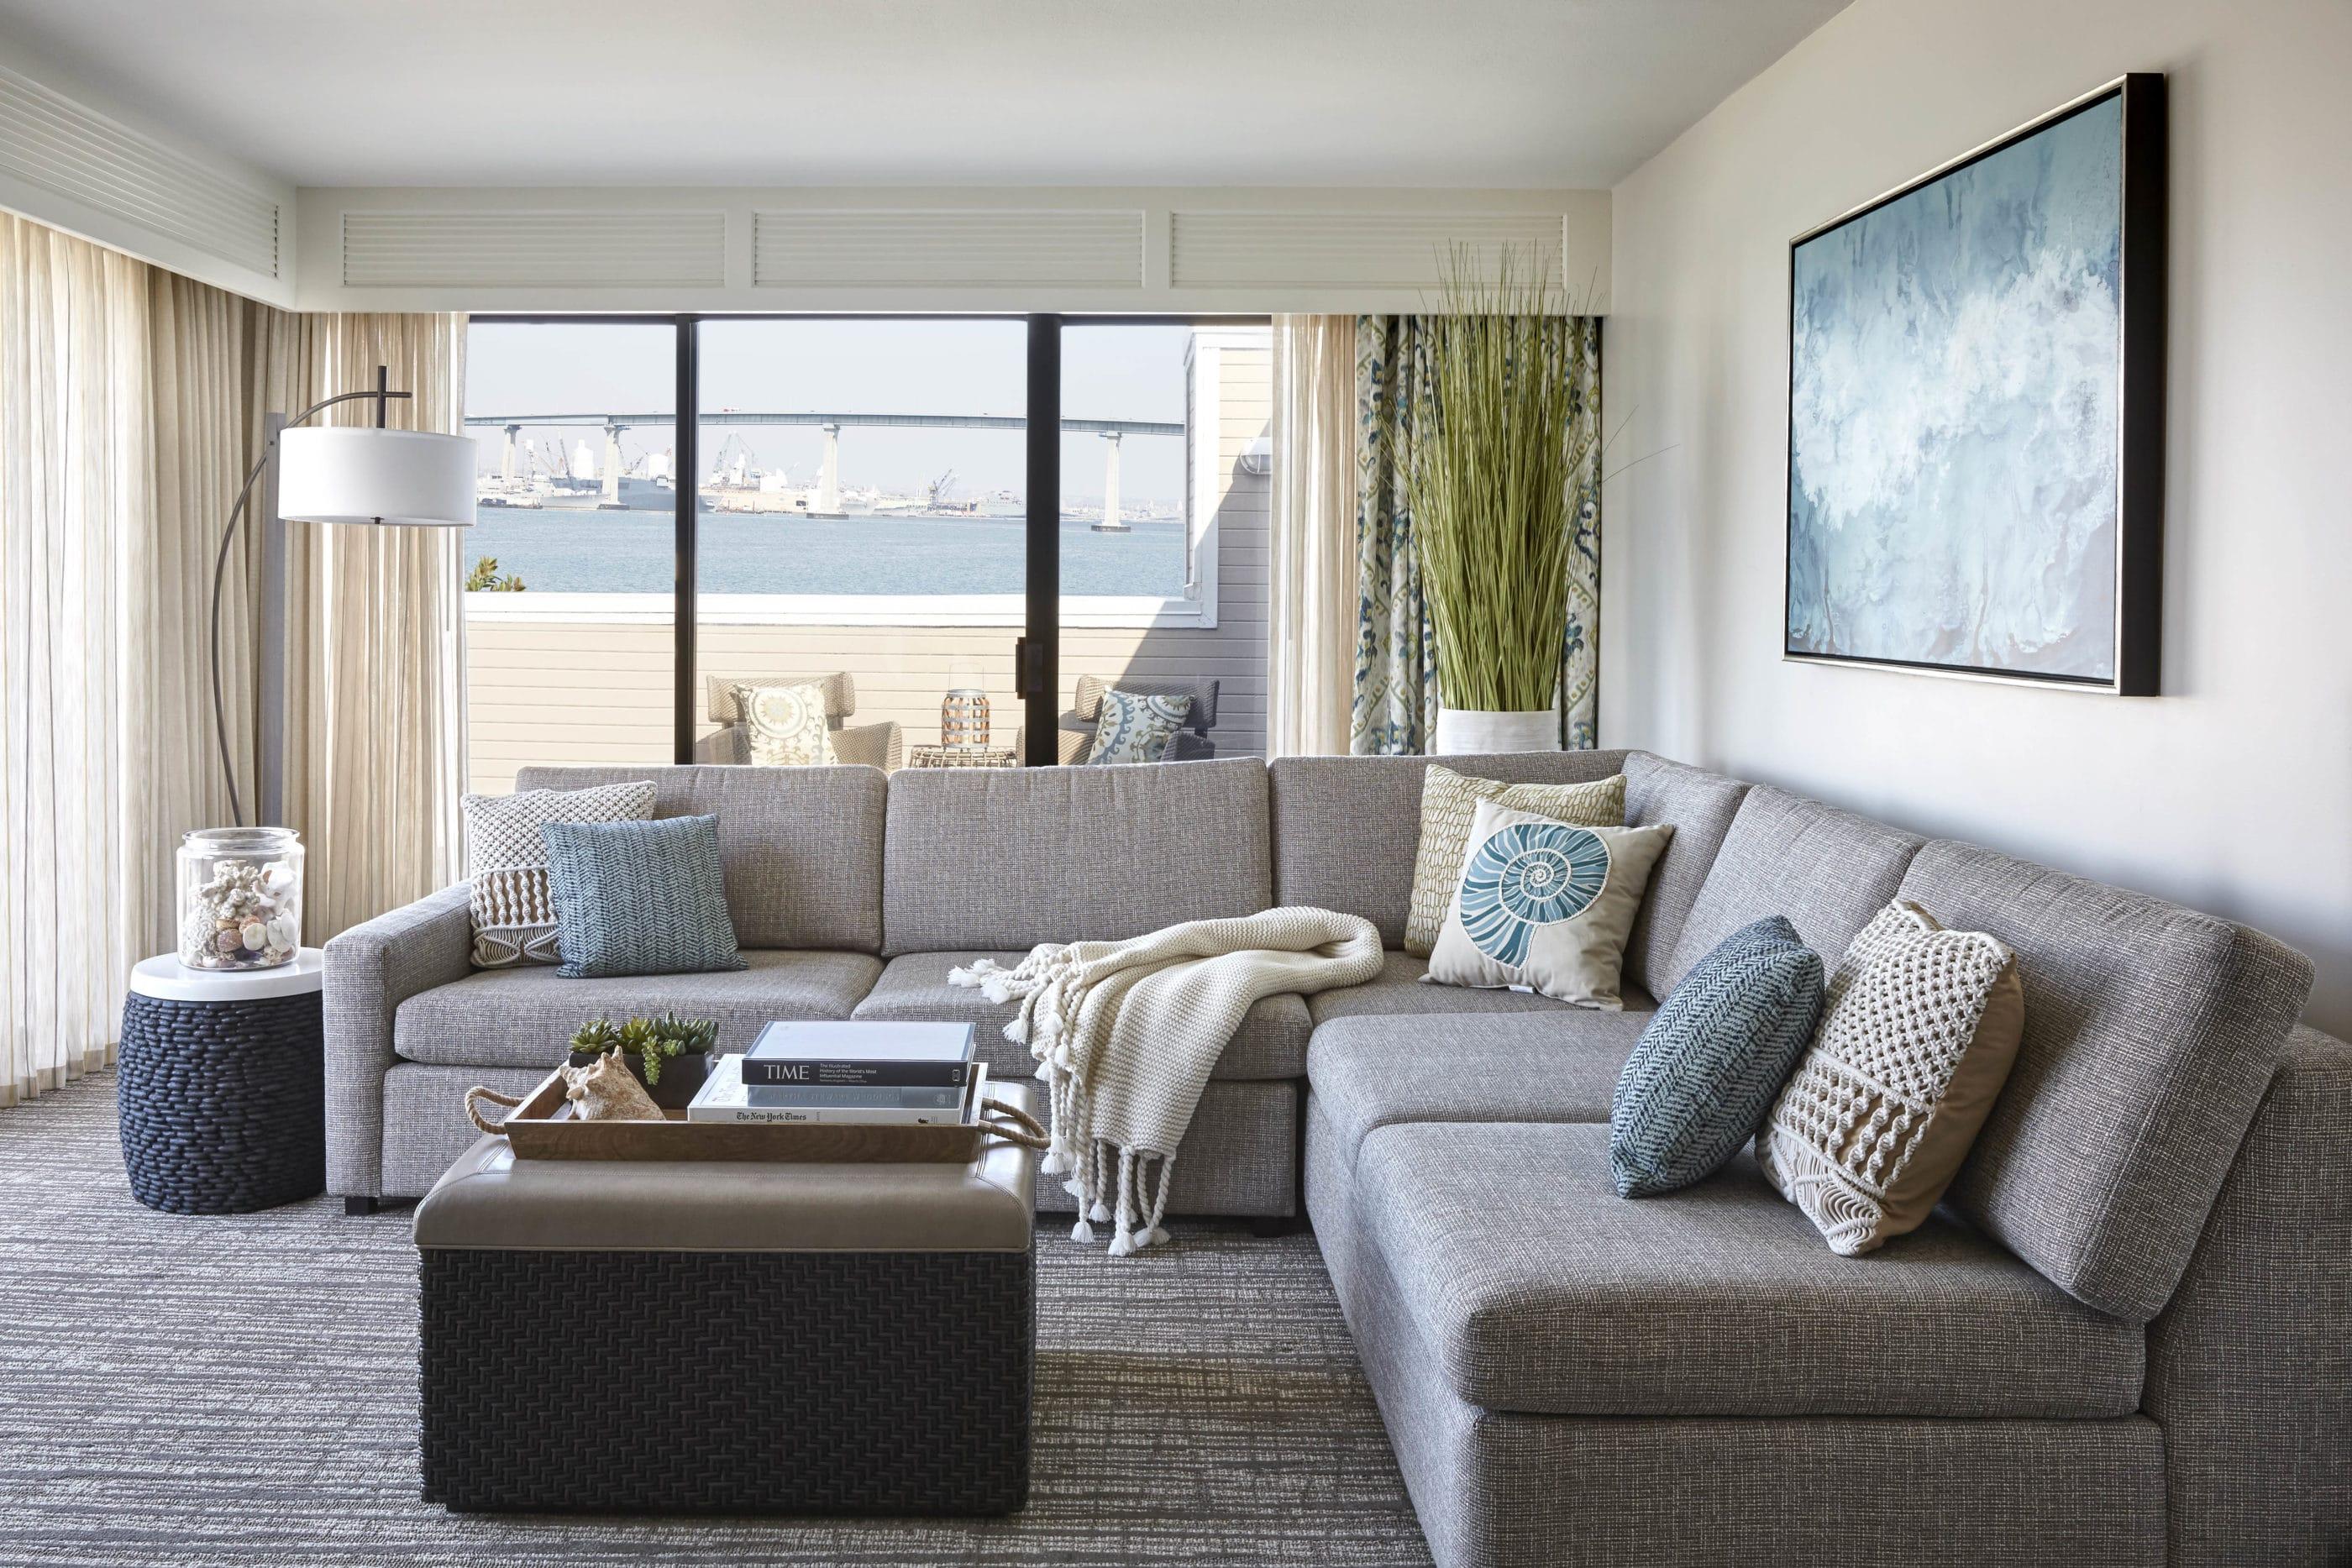 Executive suite living room at Coronado Island Marriott